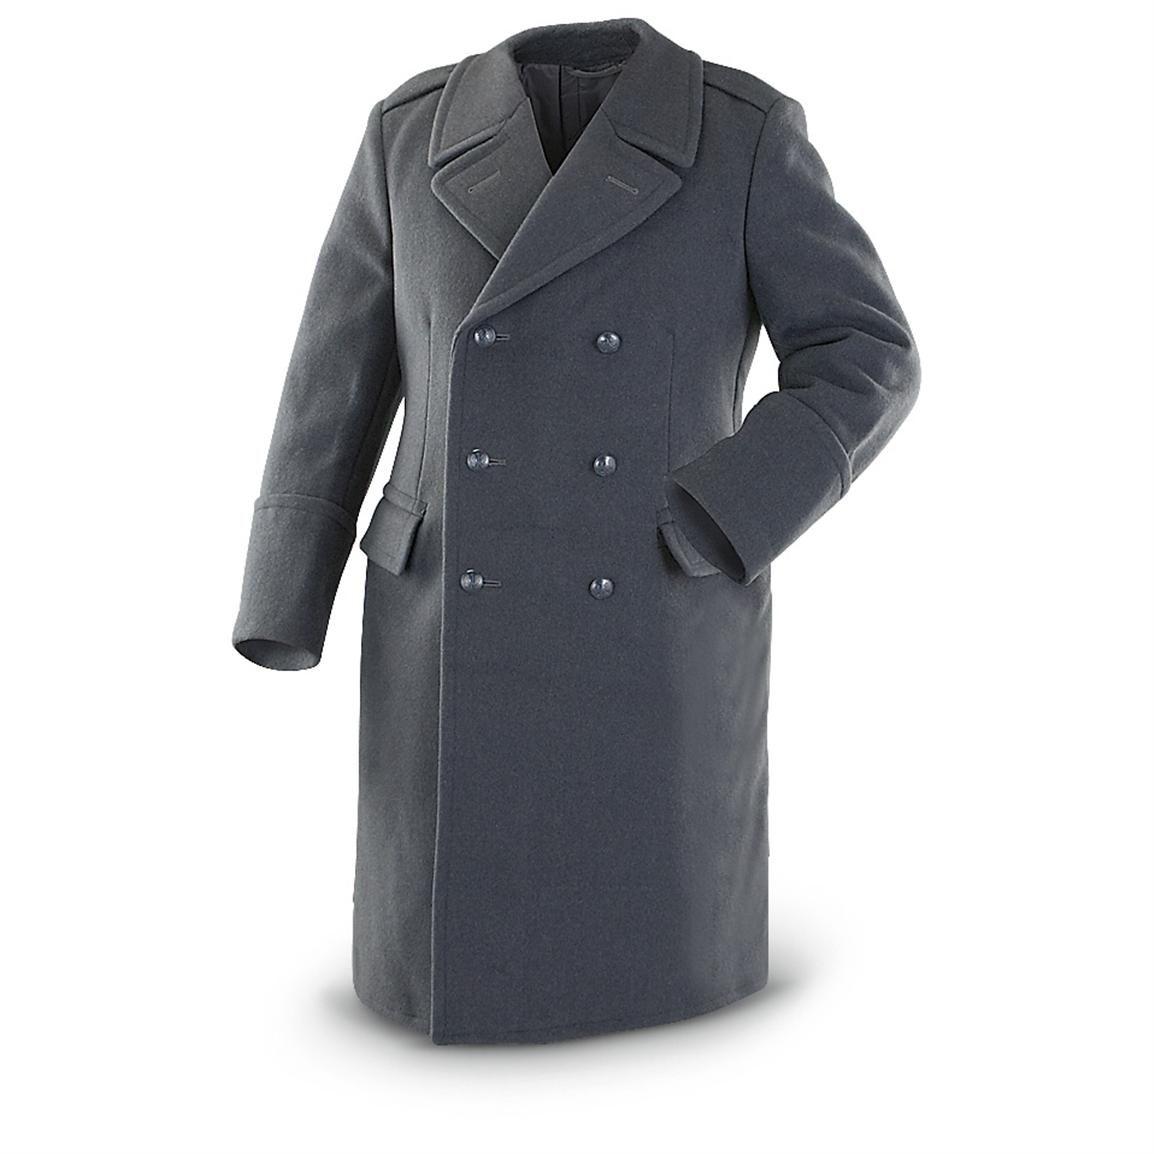 New Polish Military Wool Overcoat Blue Gray Acceptable For Lw Helferin Overcoat Wool Overcoat Gray Wool Coat Warm Outerwear [ 1154 x 1154 Pixel ]